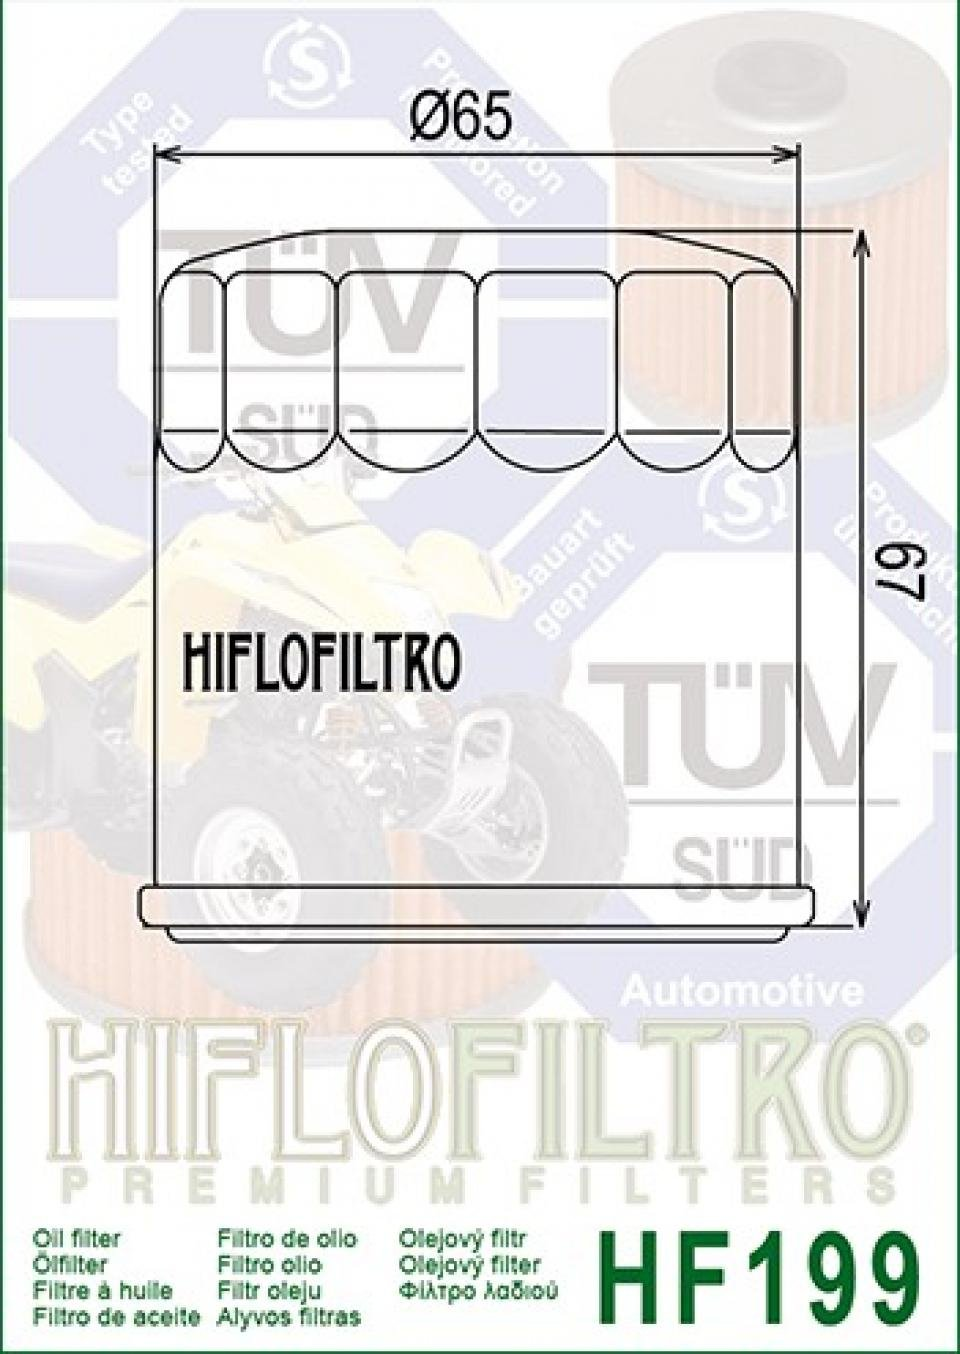 Filtre /à huile Hiflo HF199 quad Polaris 570 Sportsman 2014 /à 2016 2520799 Neuf